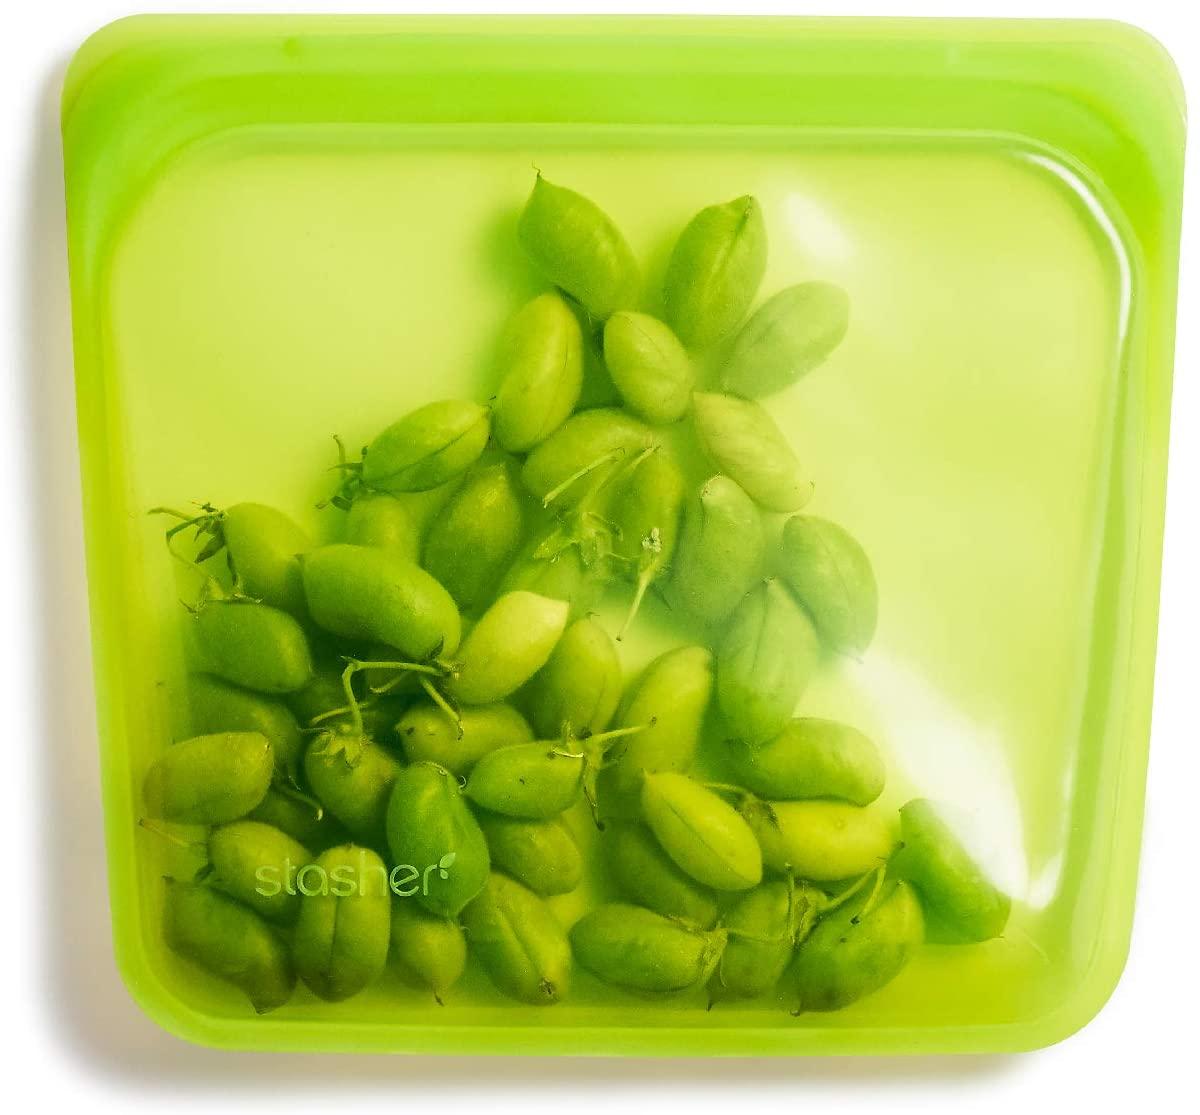 Stasher Reusable Freezer bags